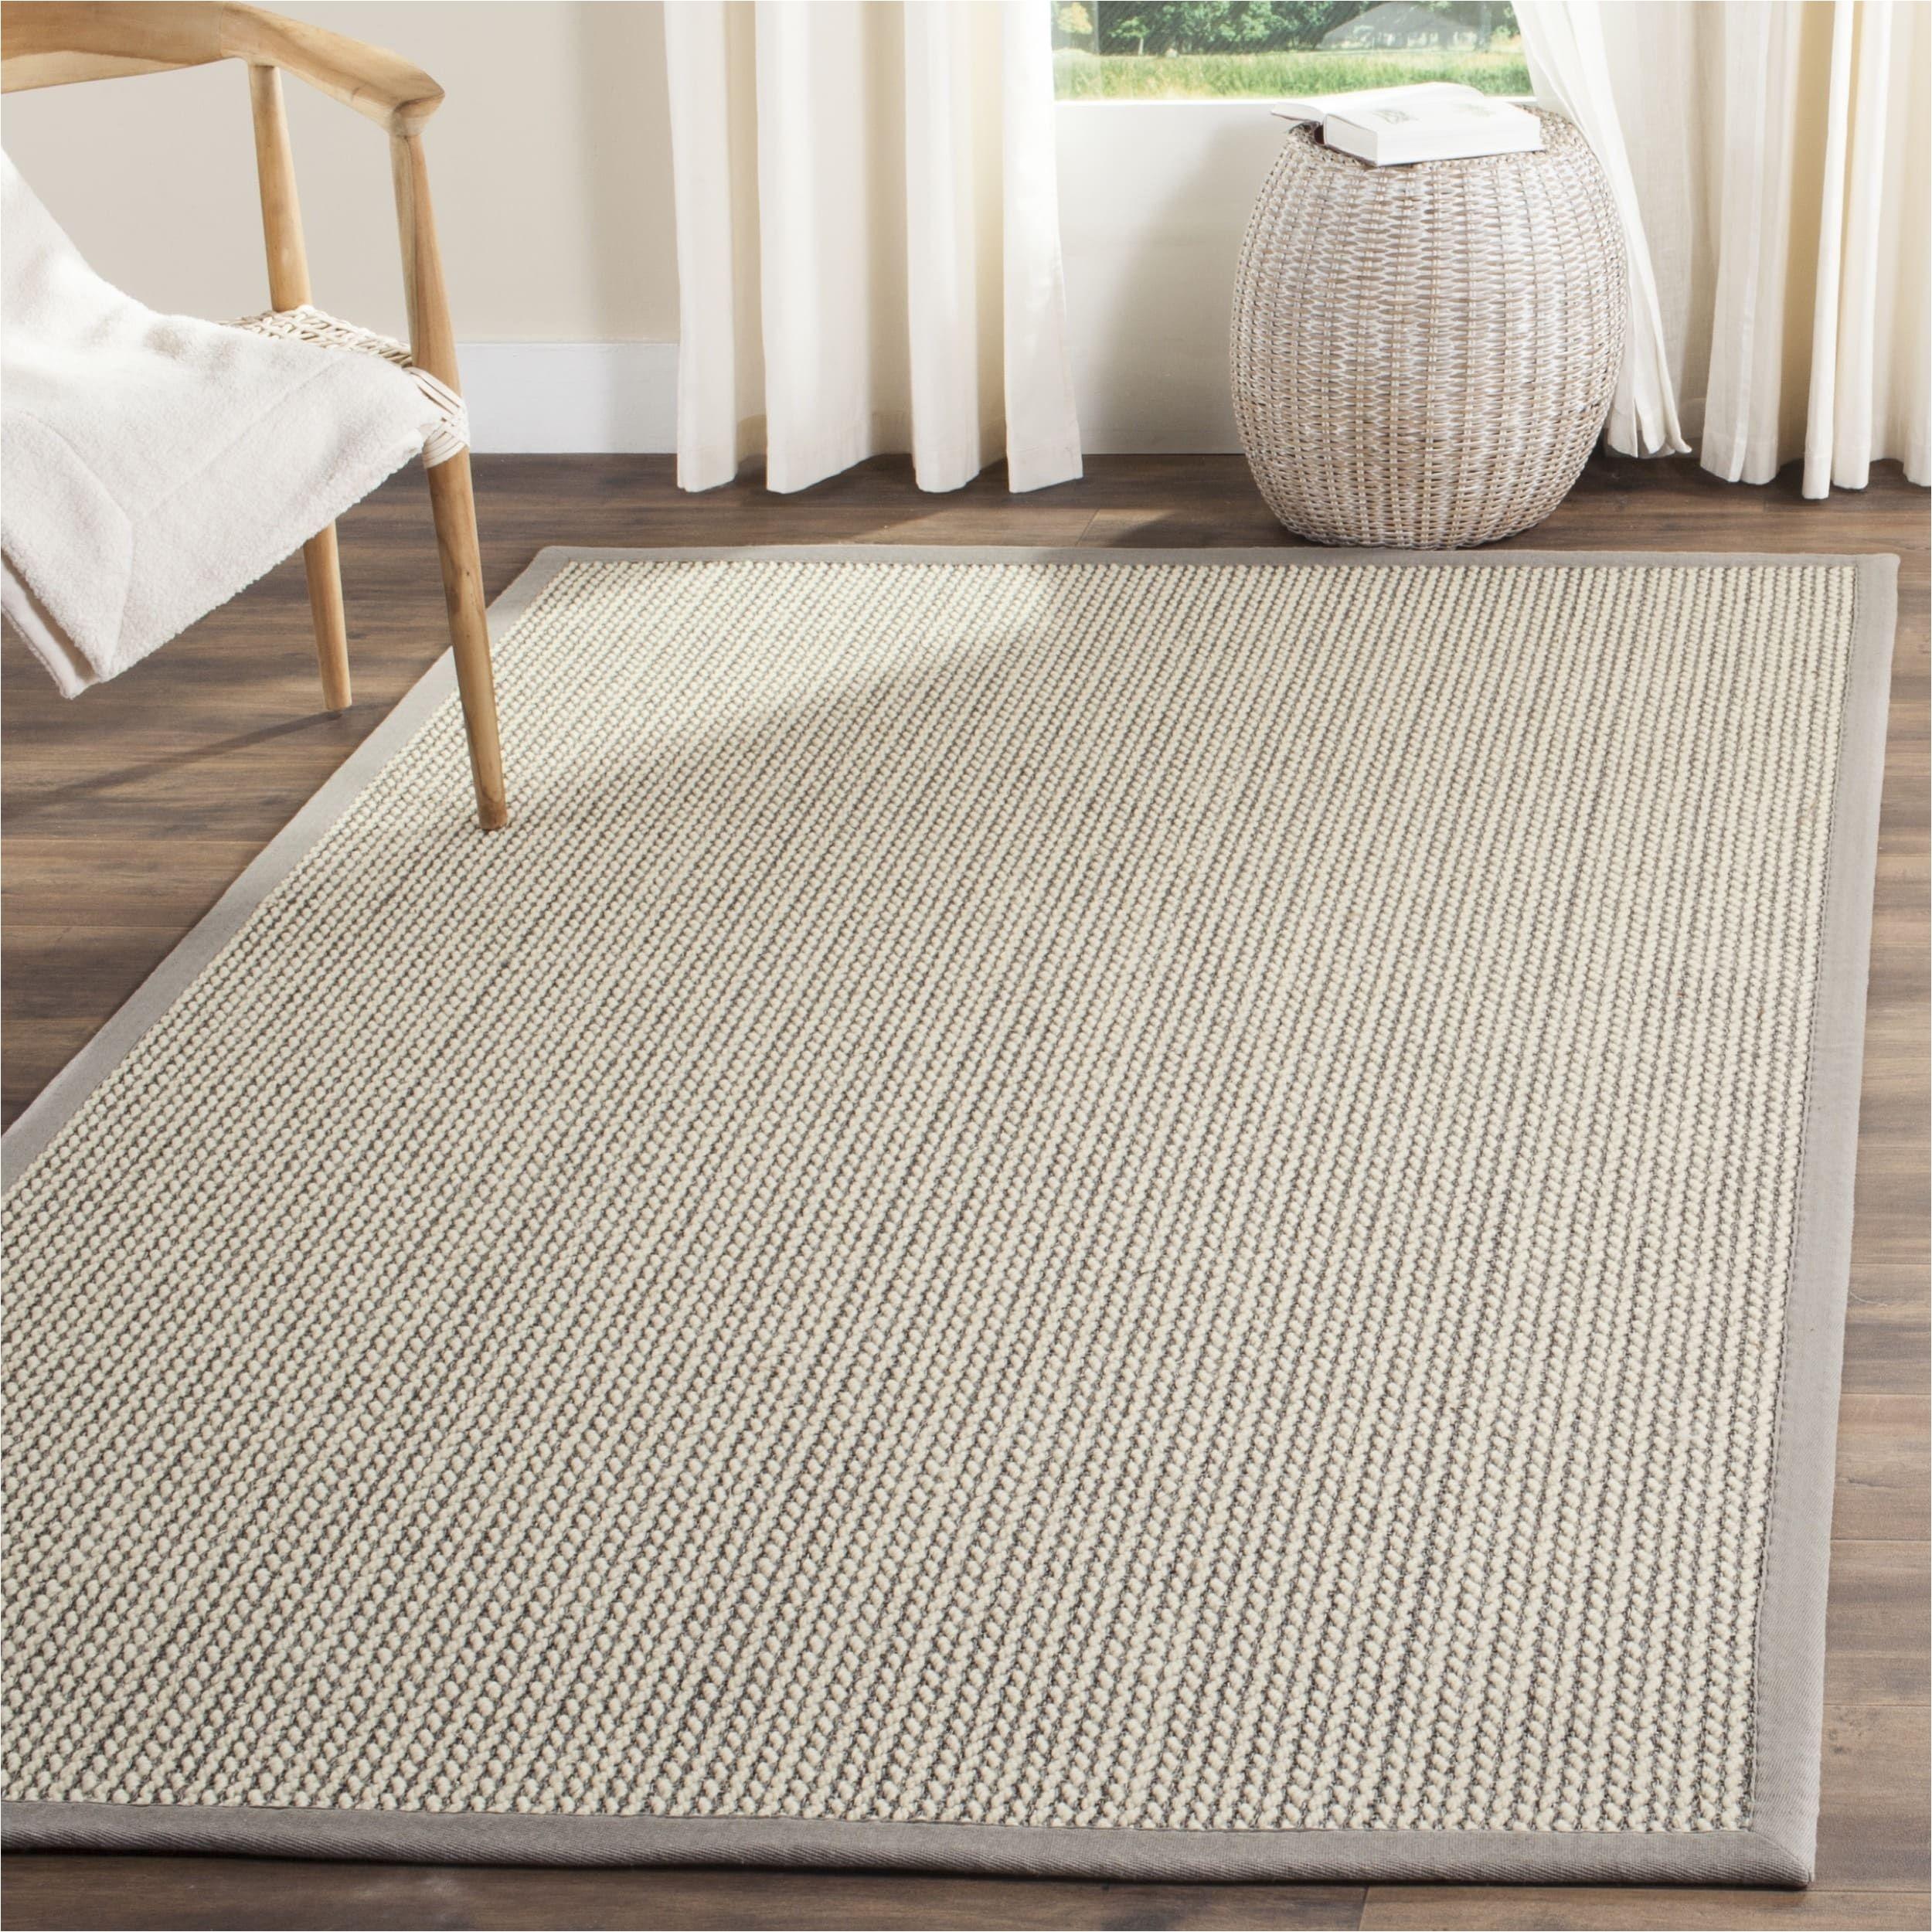 safavieh casual natural fiber handmade grey sisal rug 6 x 9 overstock com shopping the best deals on 5x8 6x9 rugs